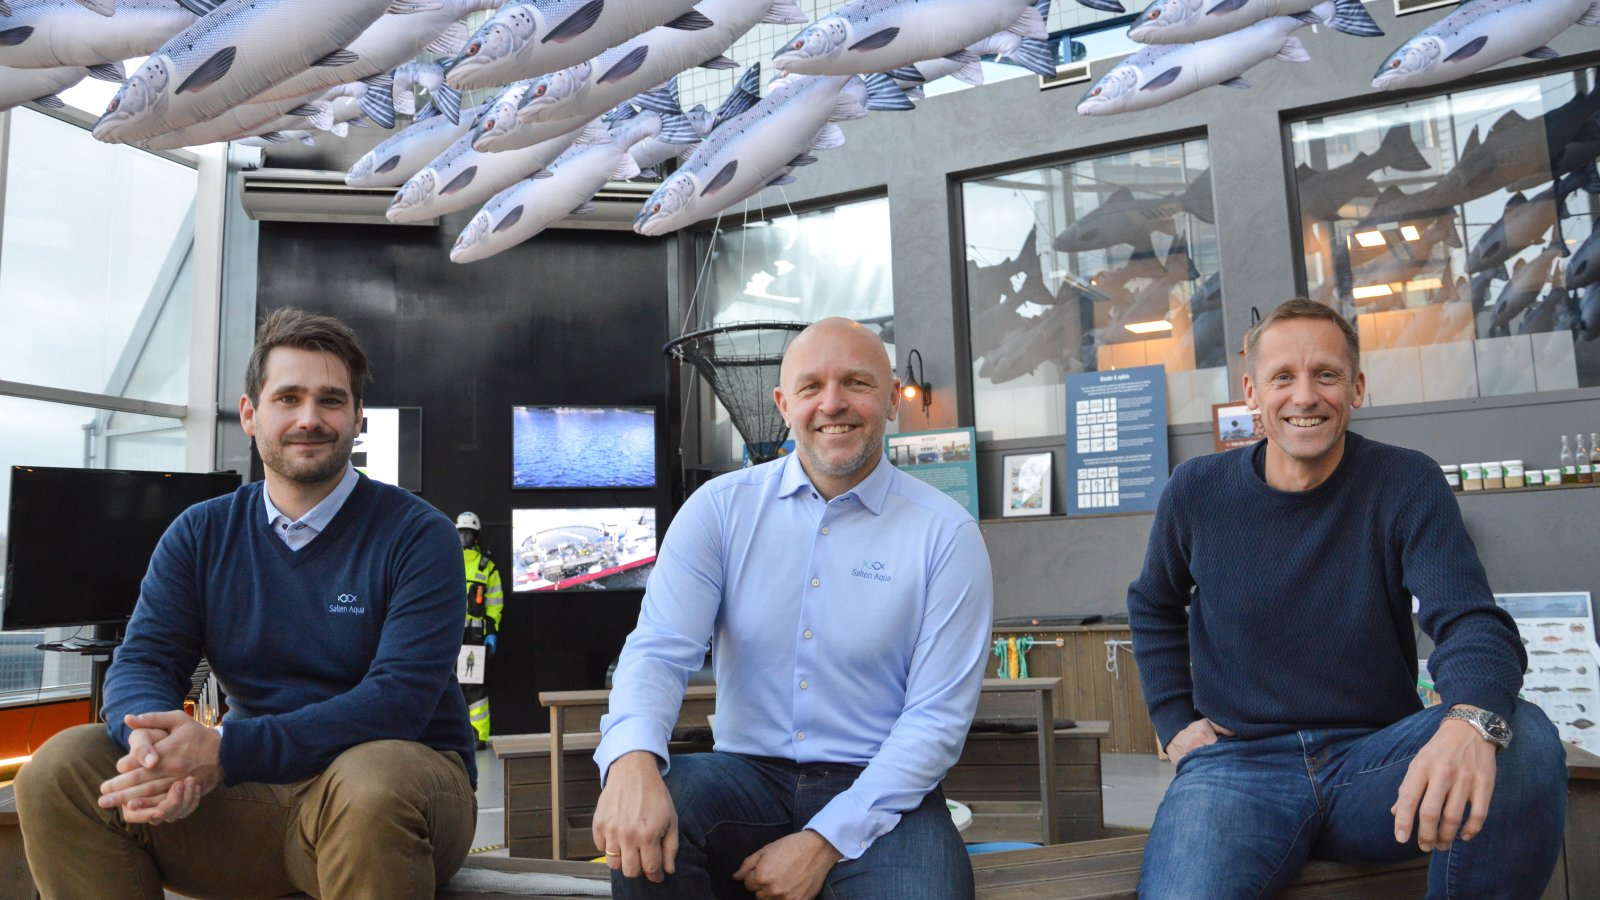 Salten Aqua ved controller John-Christian Andreassen, viseadministrerende direktør Jarle Solemdal og miljøsjef Asbjørn Hagen.